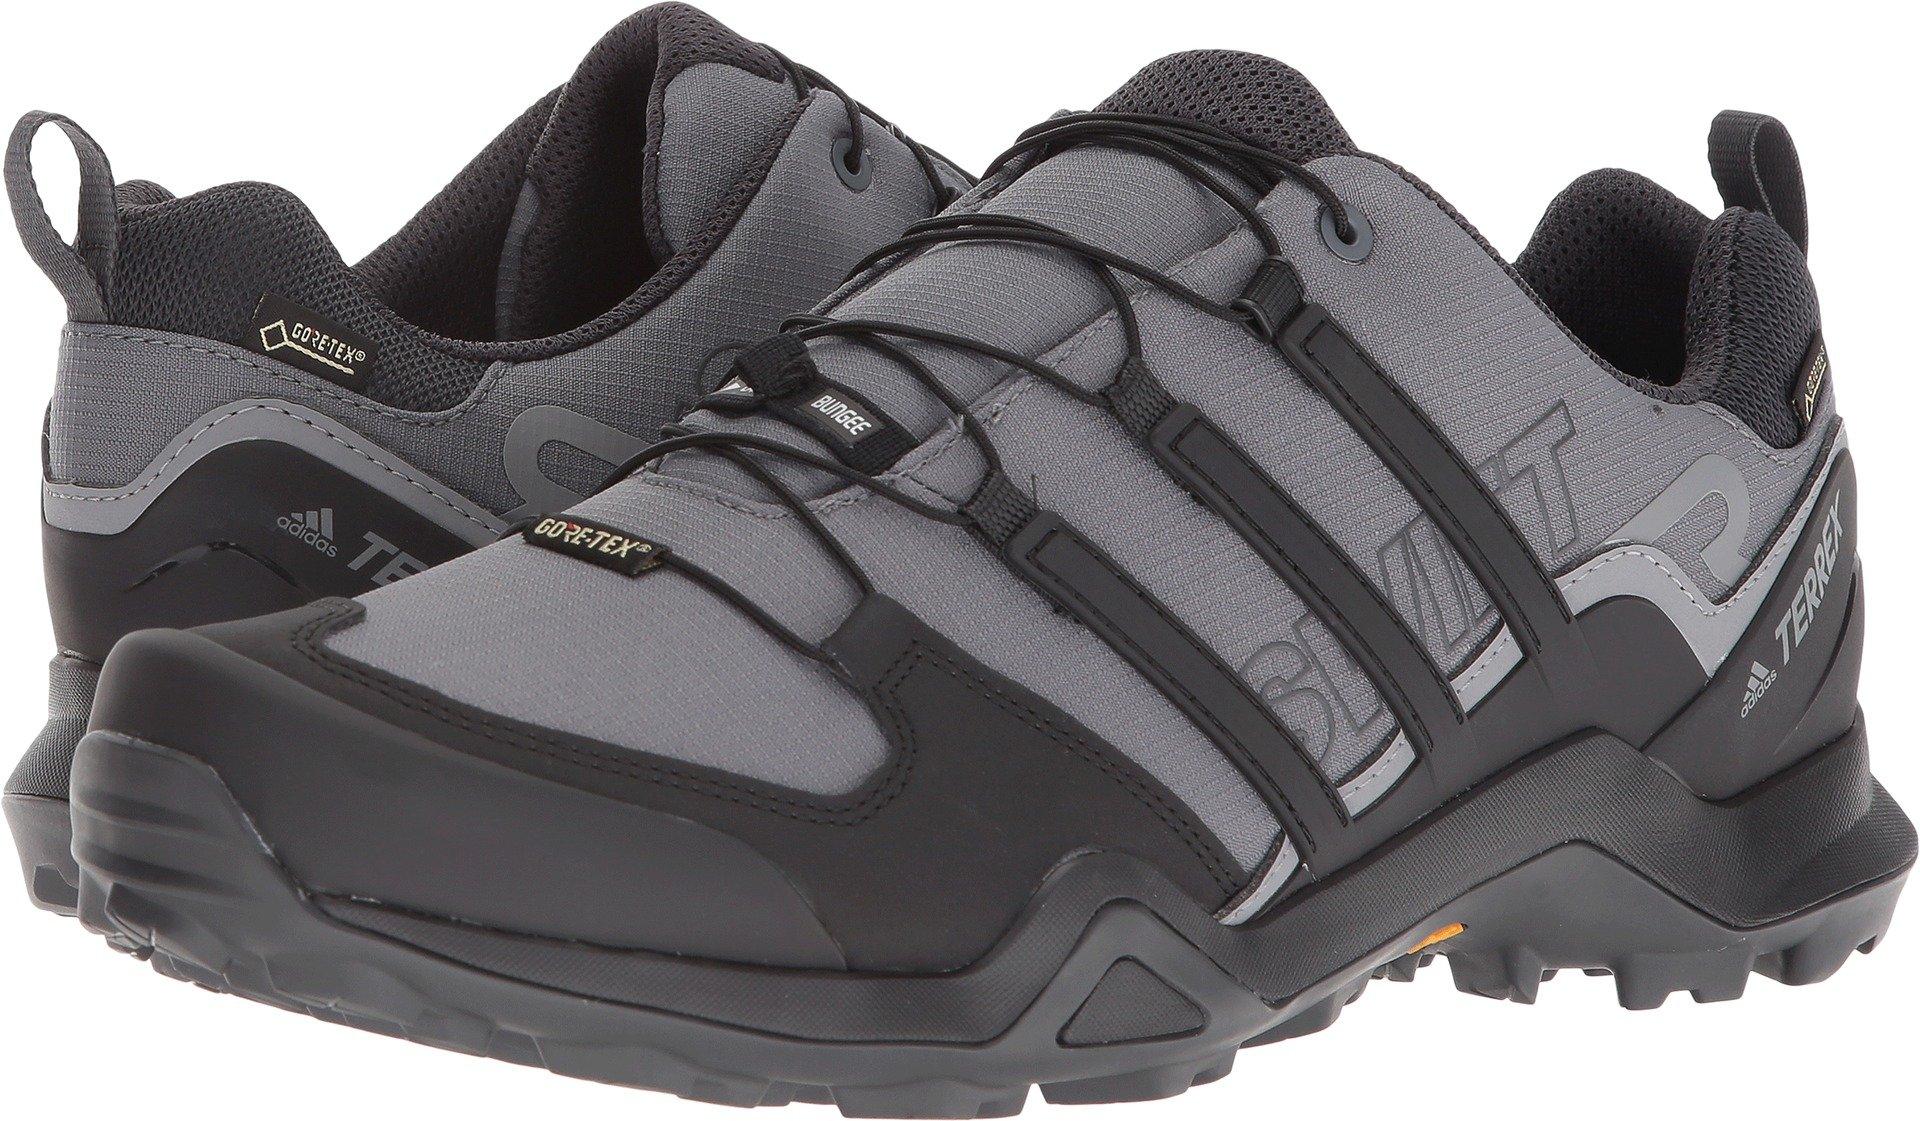 cheaper b4b17 aa535 Galleon - Adidas Outdoor Men s Terrex Swift R2 GTX¿ Grey Five Black Carbon  11 D US